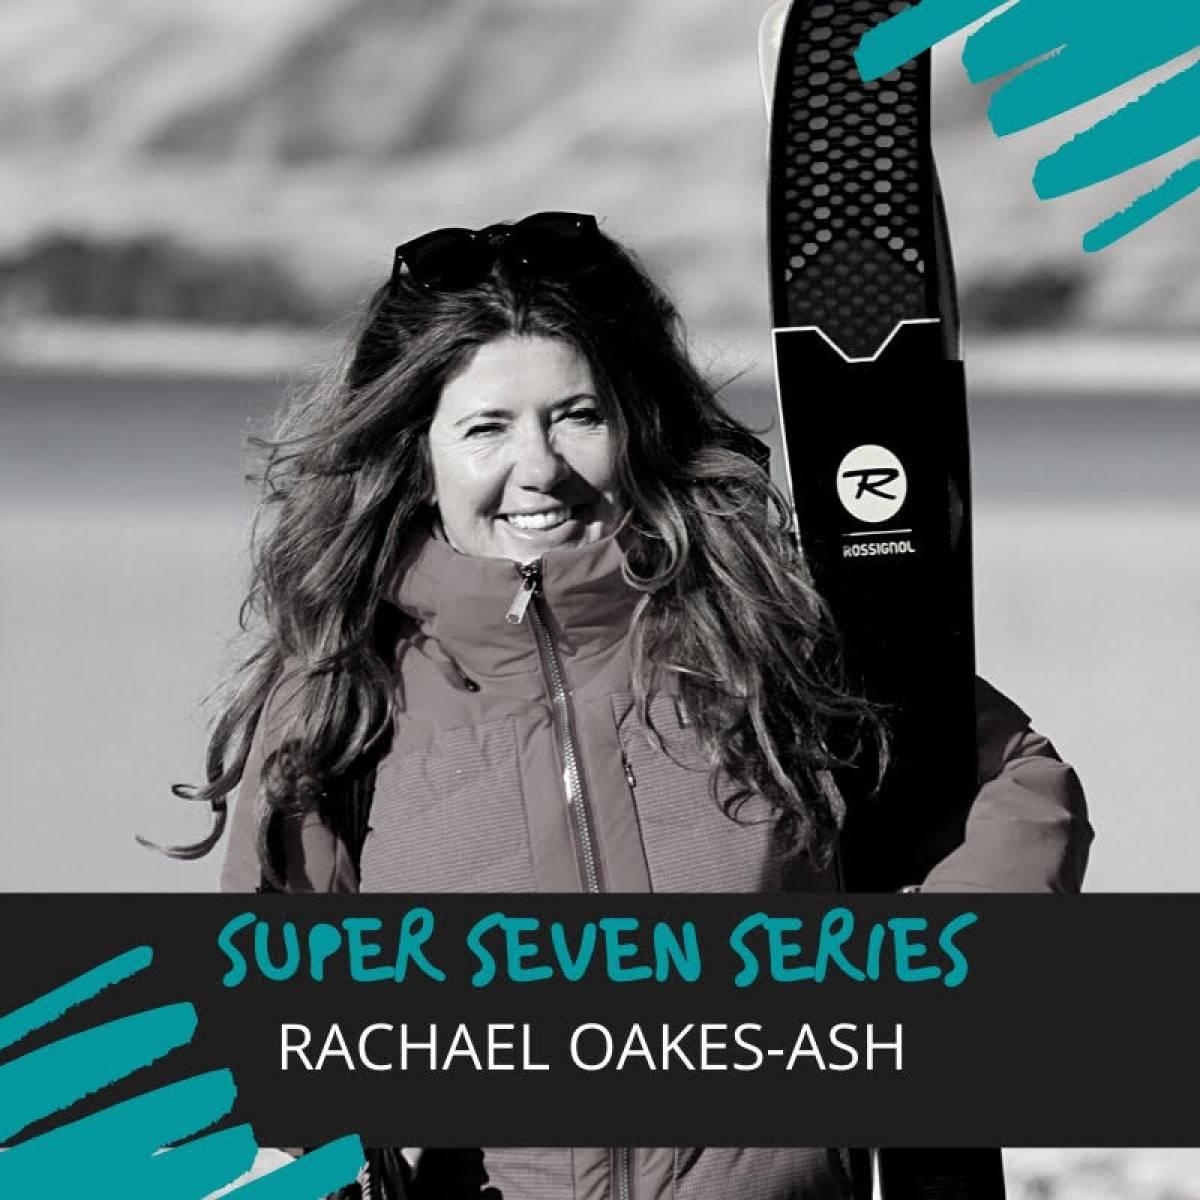 The Super Seven Series - Meet Miss Snow it All - Rachael Oakes-Ash